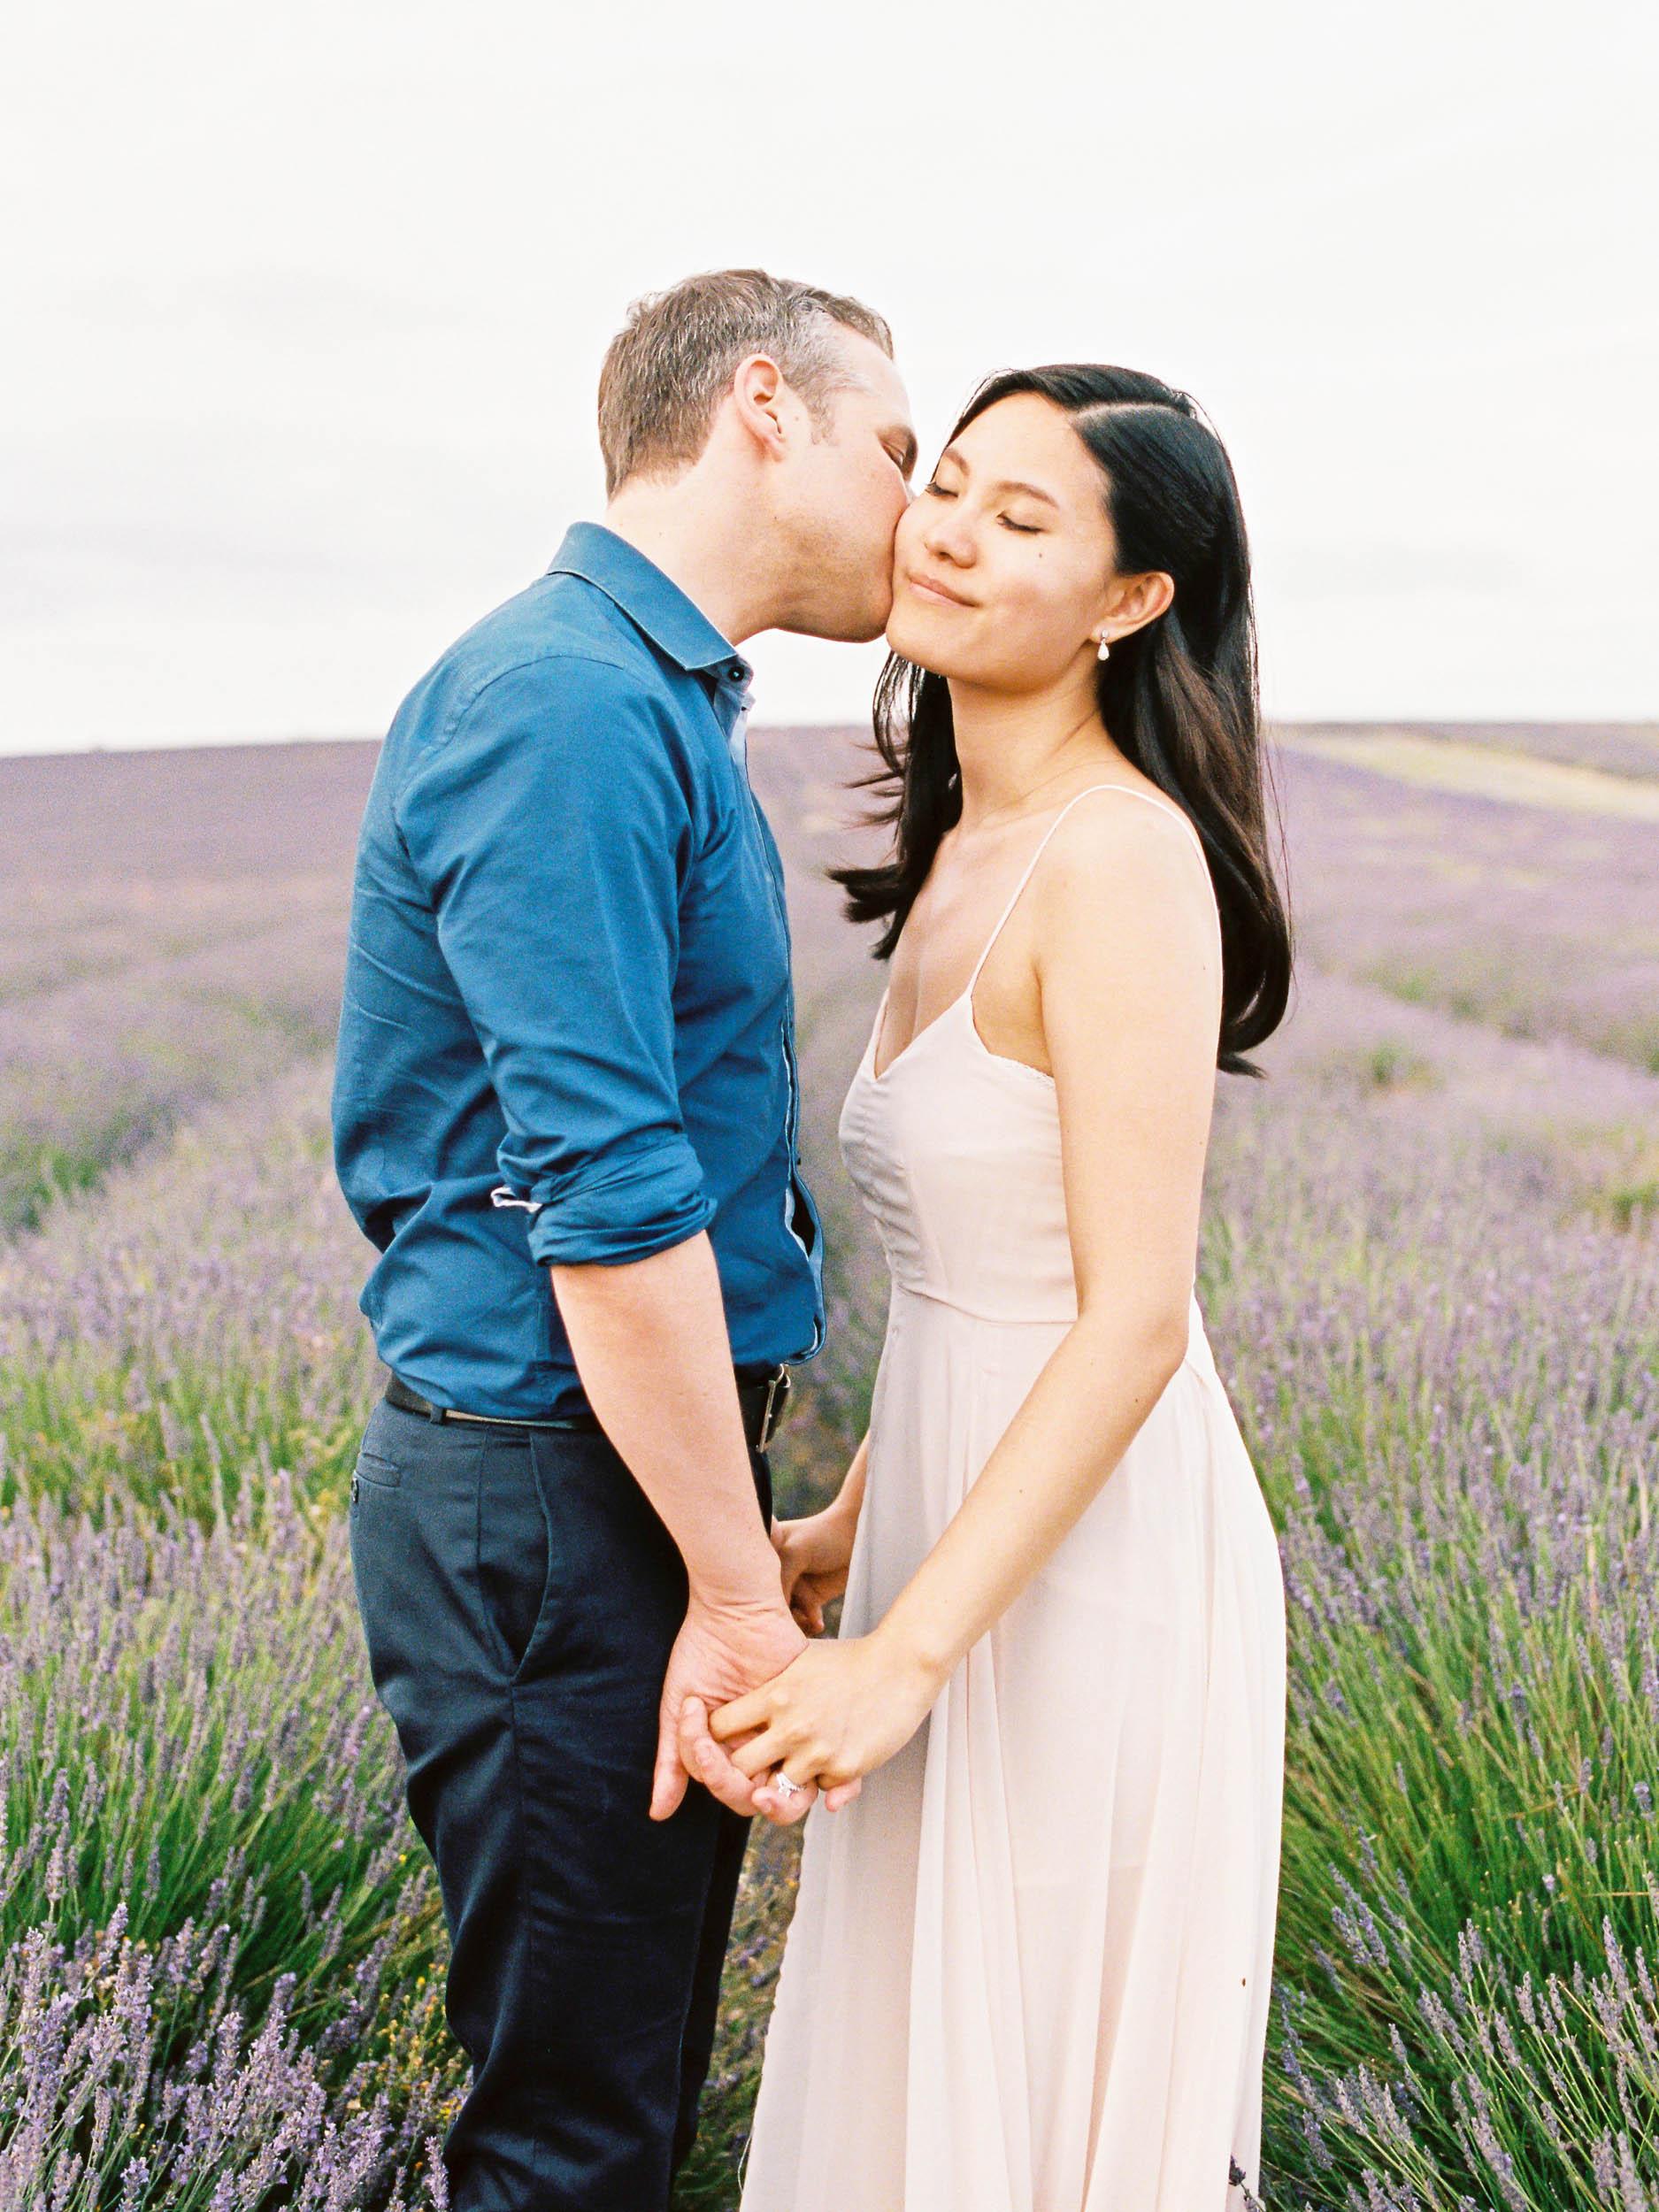 Amy O'Boyle Photography- Destination & UK Fine Art Film Wedding Photographer- Hitchin Lavender Engagement Shoot-5.jpg